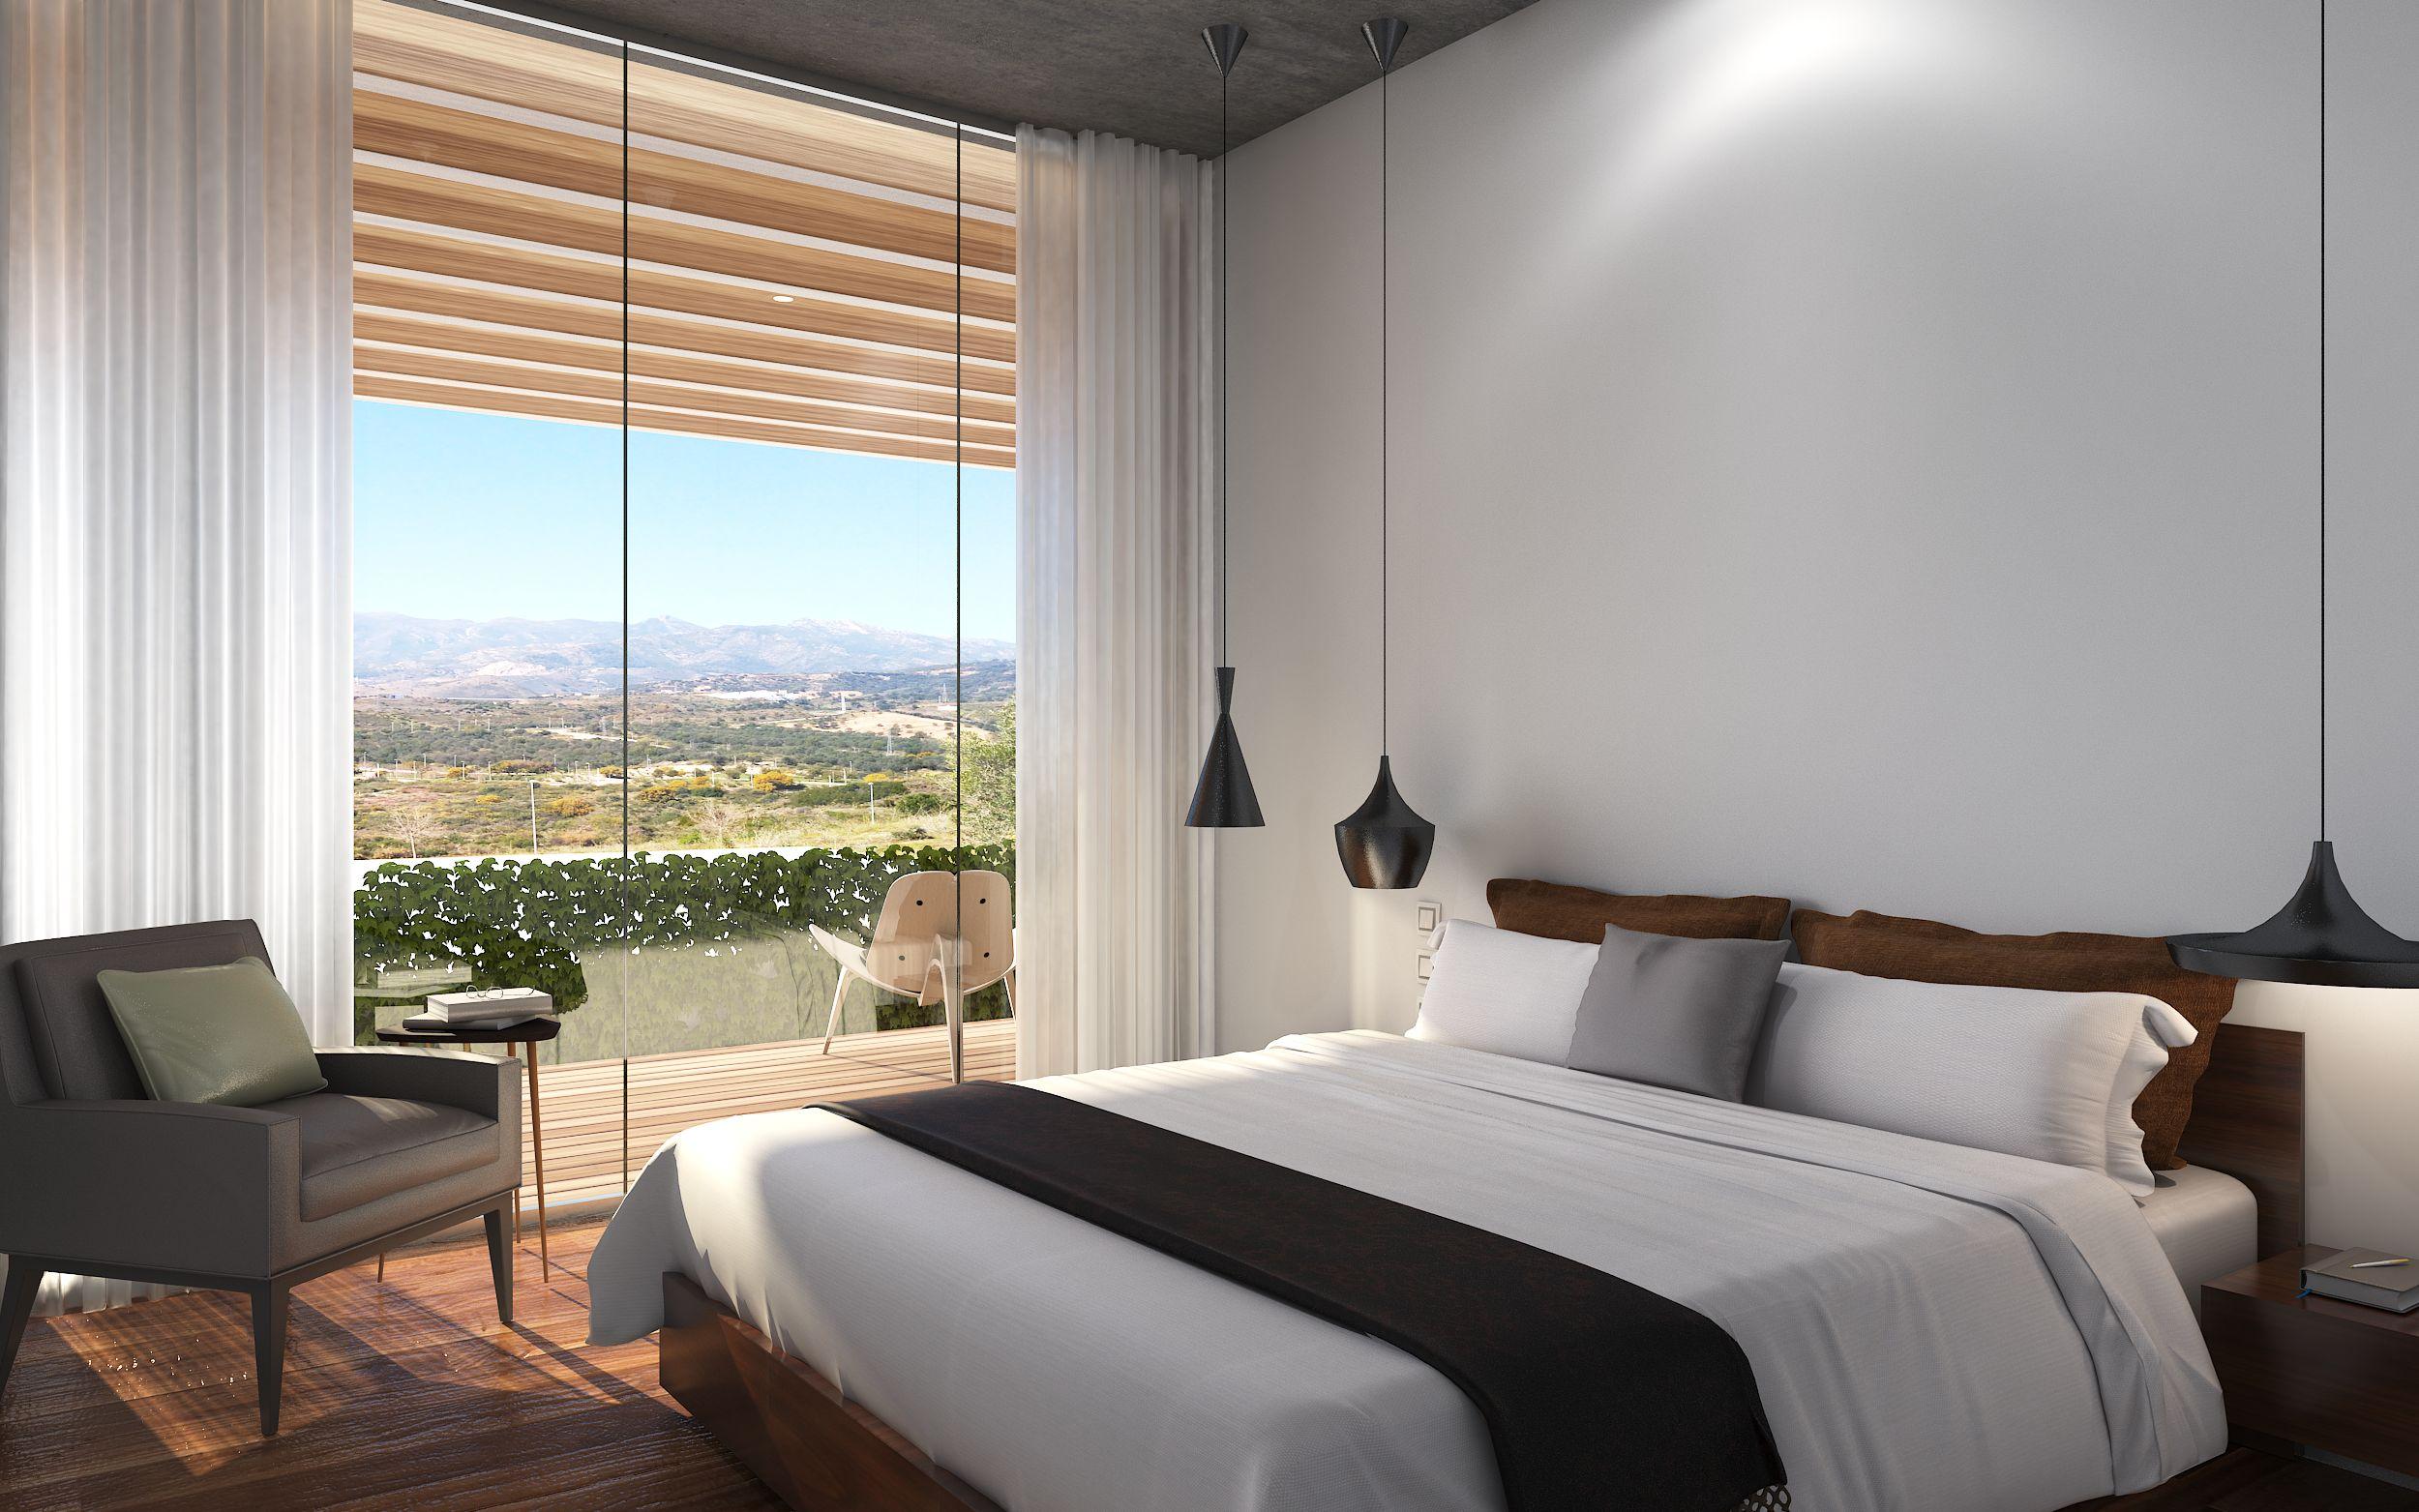 EZAR-Arquitectura-Diseño-DOM3-PRIZE-2016-urbania_international-marbella-ARCADIA_07